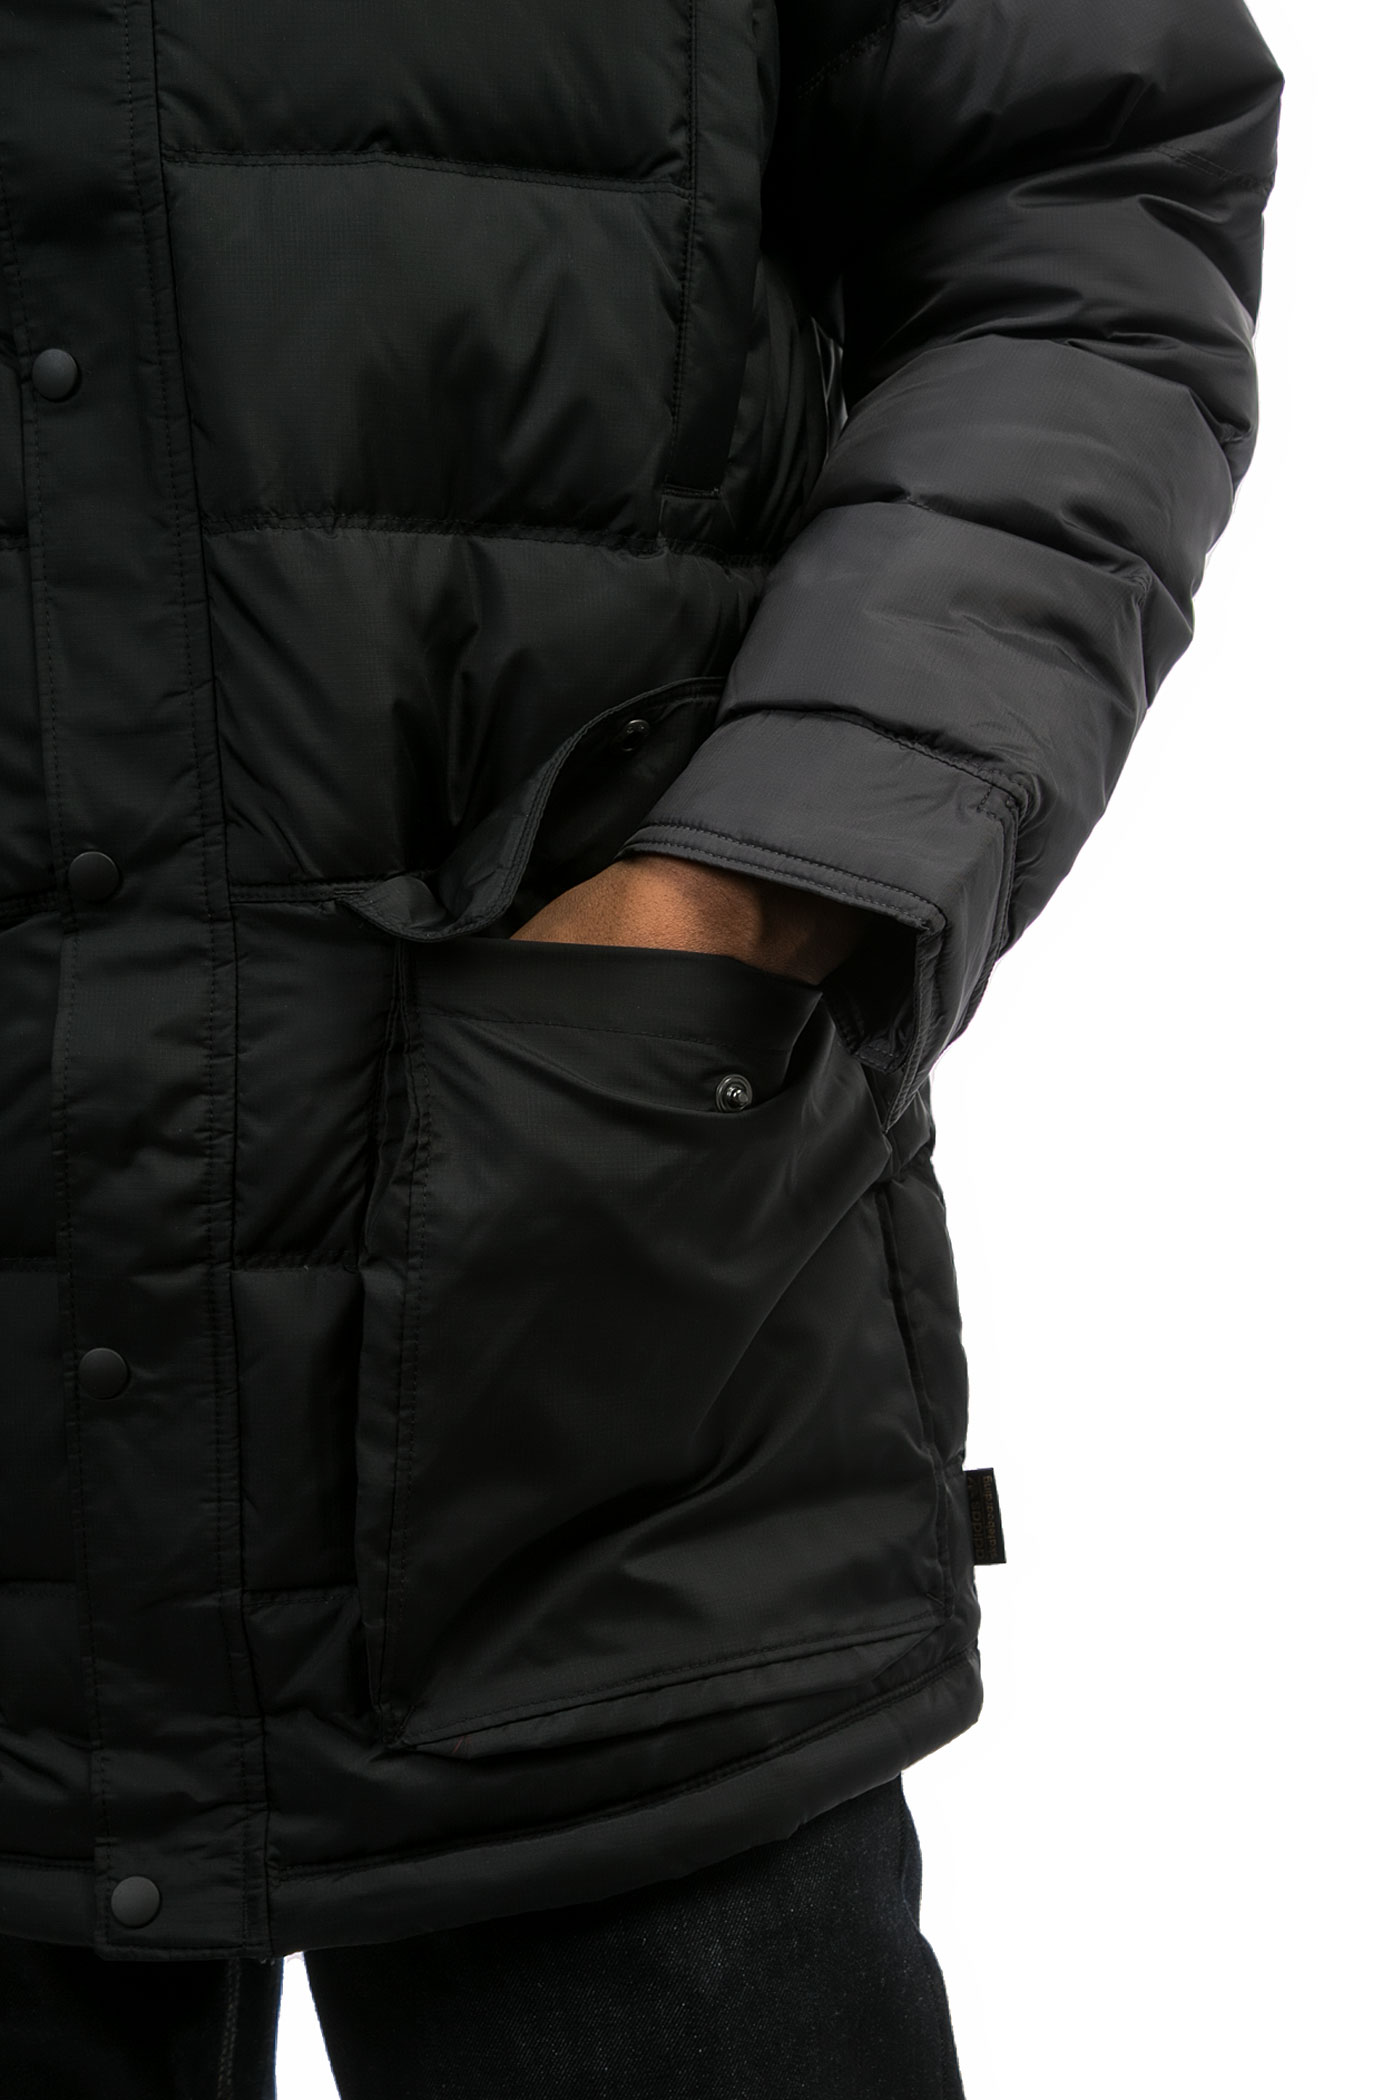 adidas down jacke black black scarlet kaufen bei skatedeluxe. Black Bedroom Furniture Sets. Home Design Ideas